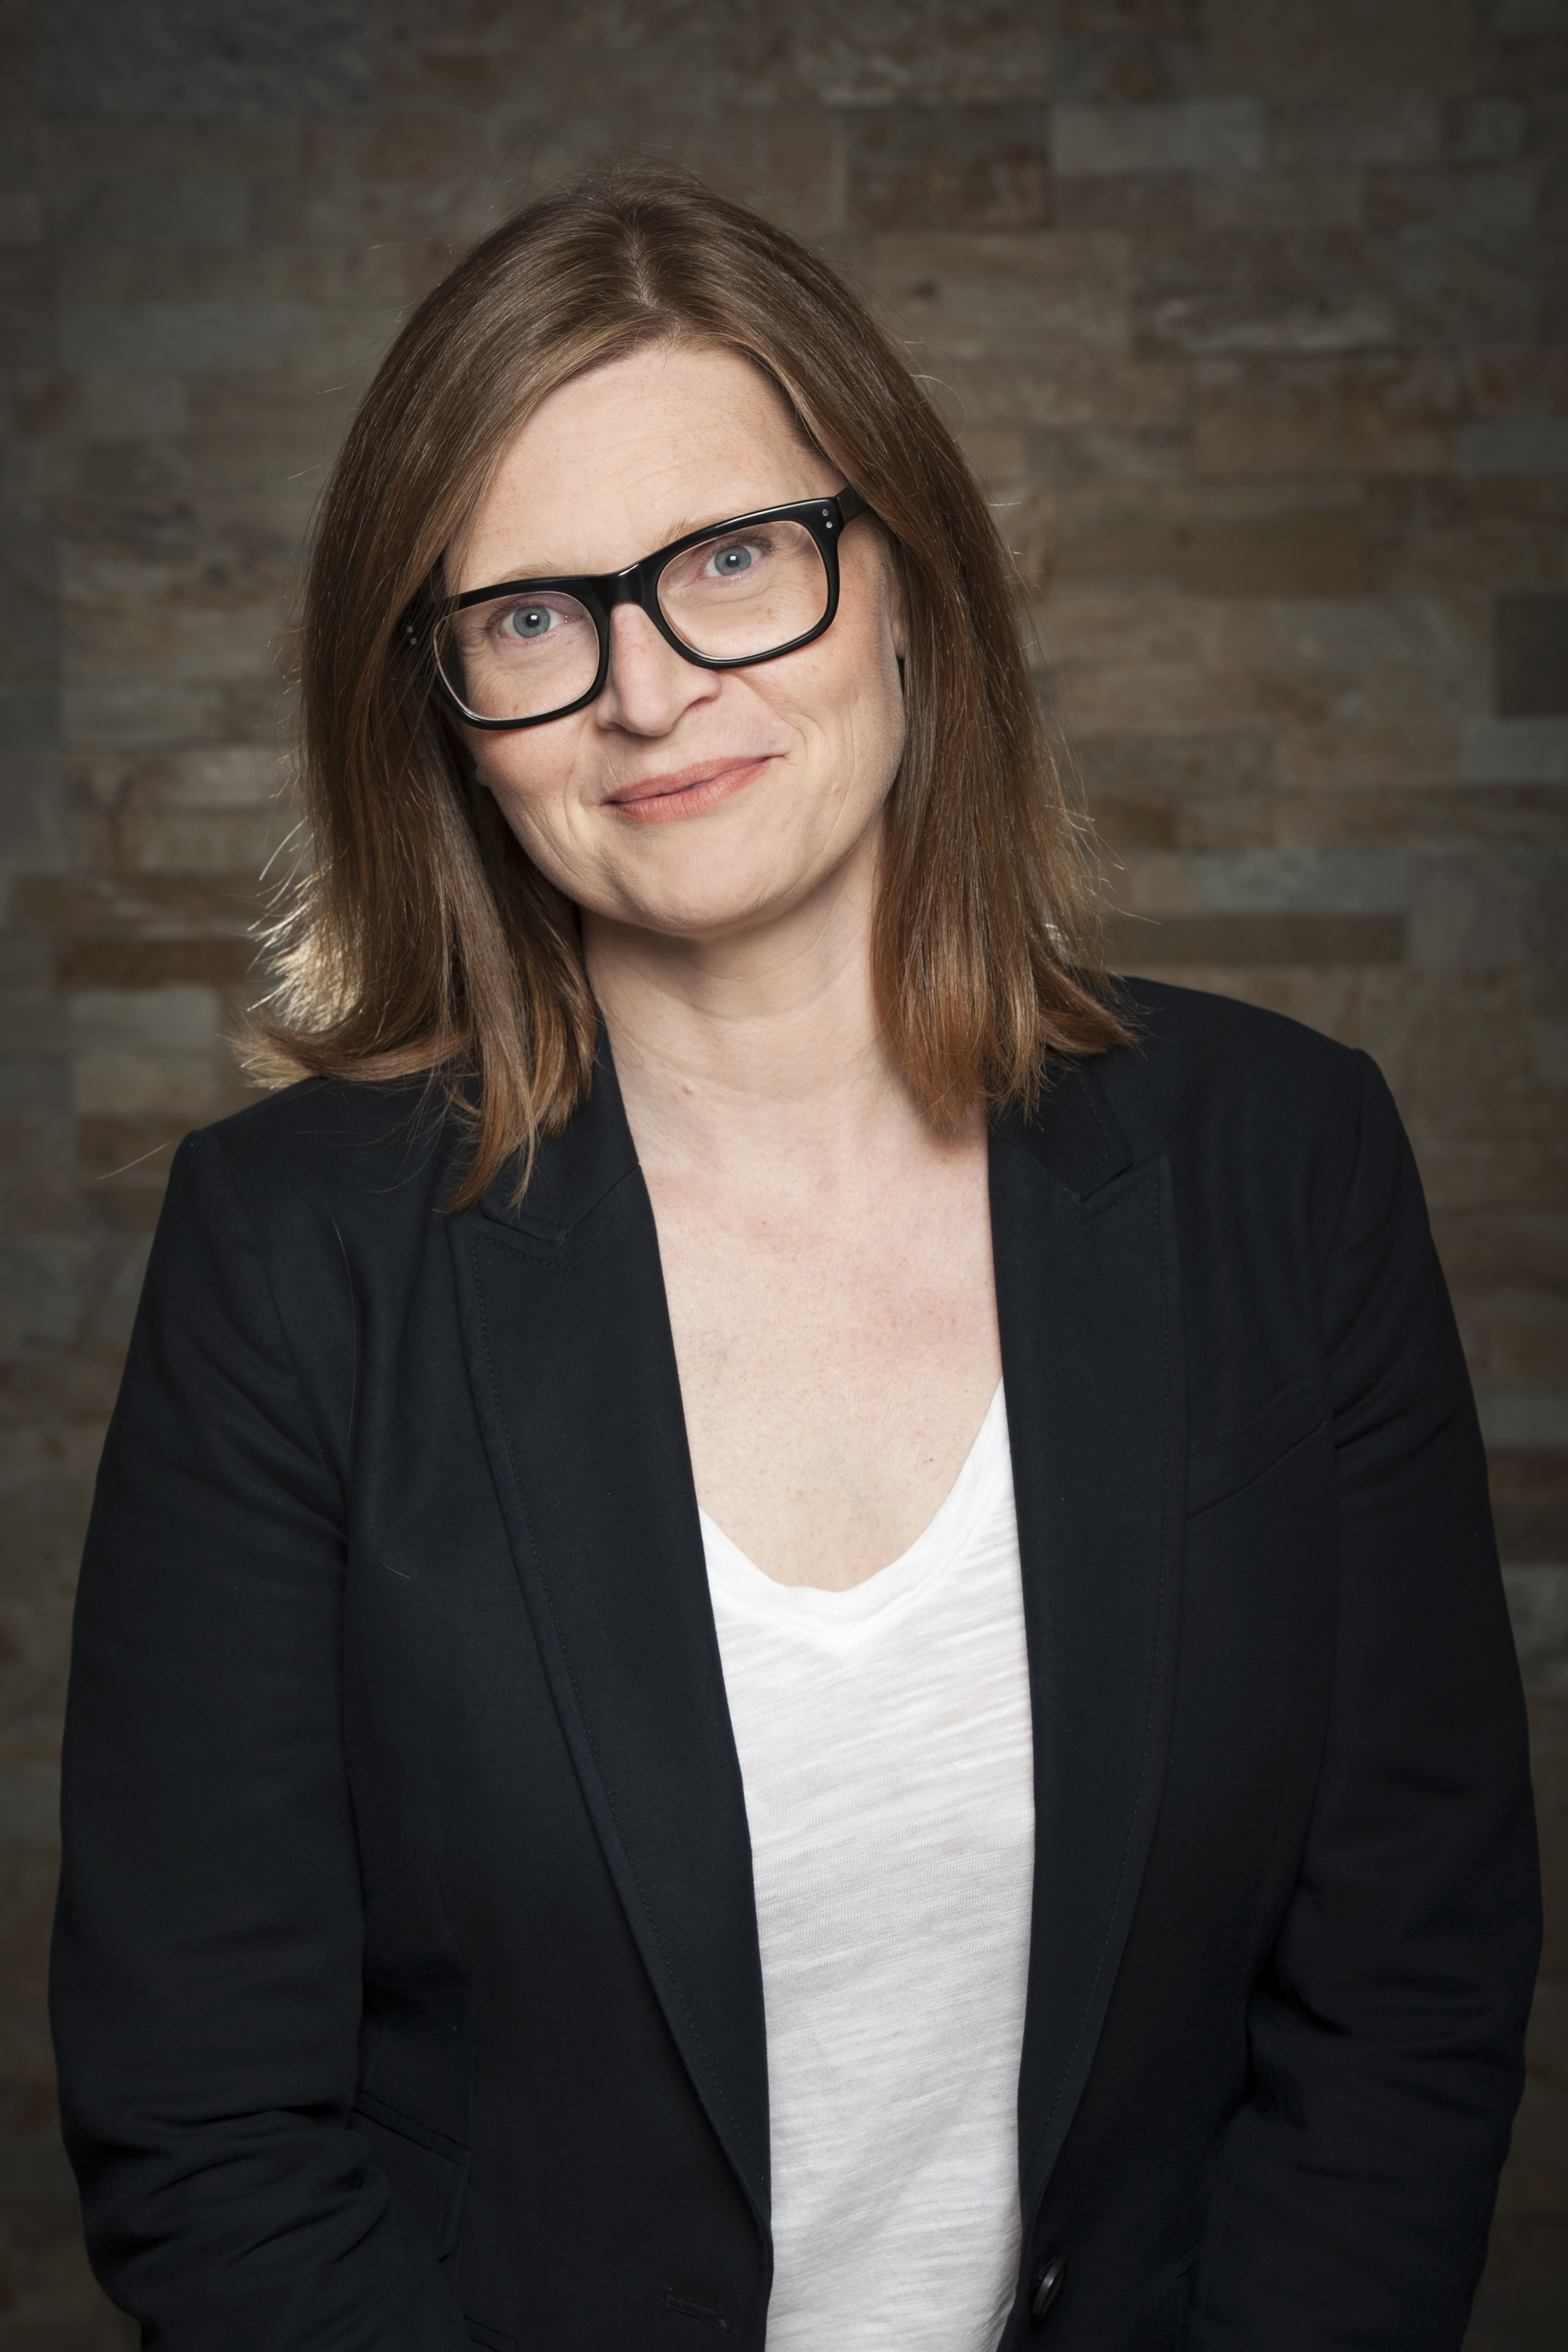 Image of woman, Professor Michelle Schira Hagerman